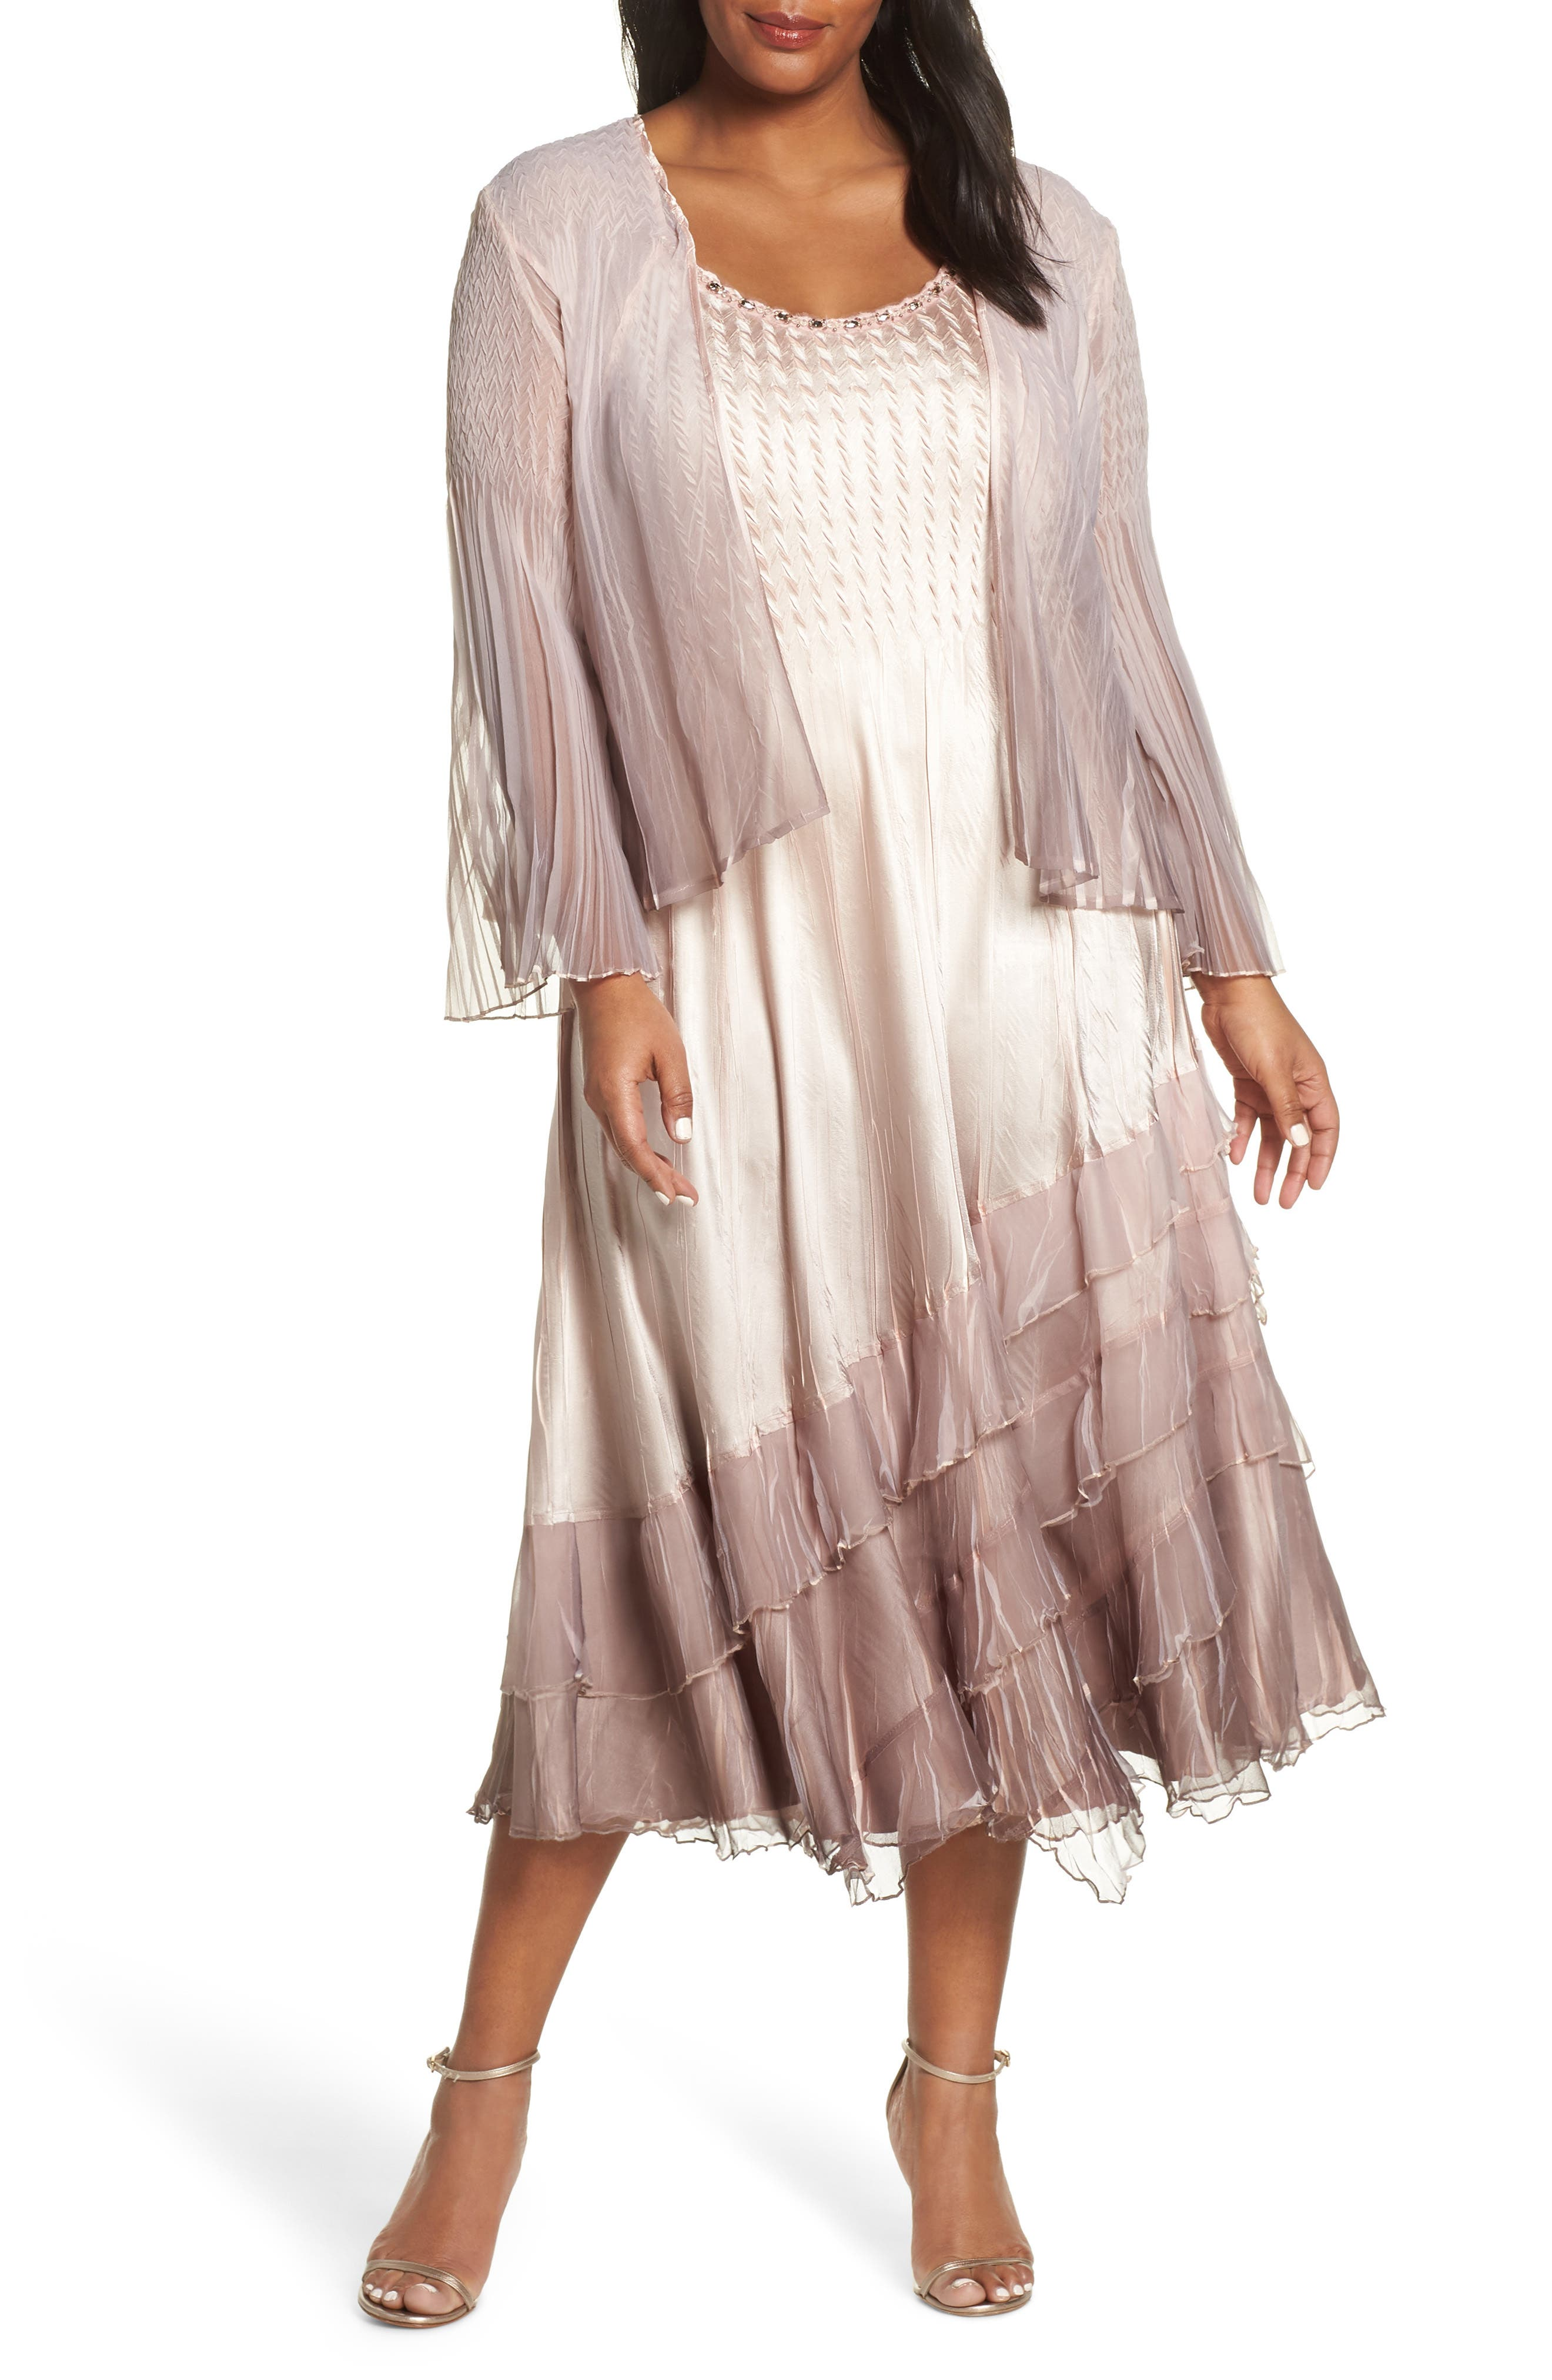 KOMAROV Tiered Hem Ombré Dress with Jacket, Main, color, VINTAGE ROSE WITH CAFE OMBRE